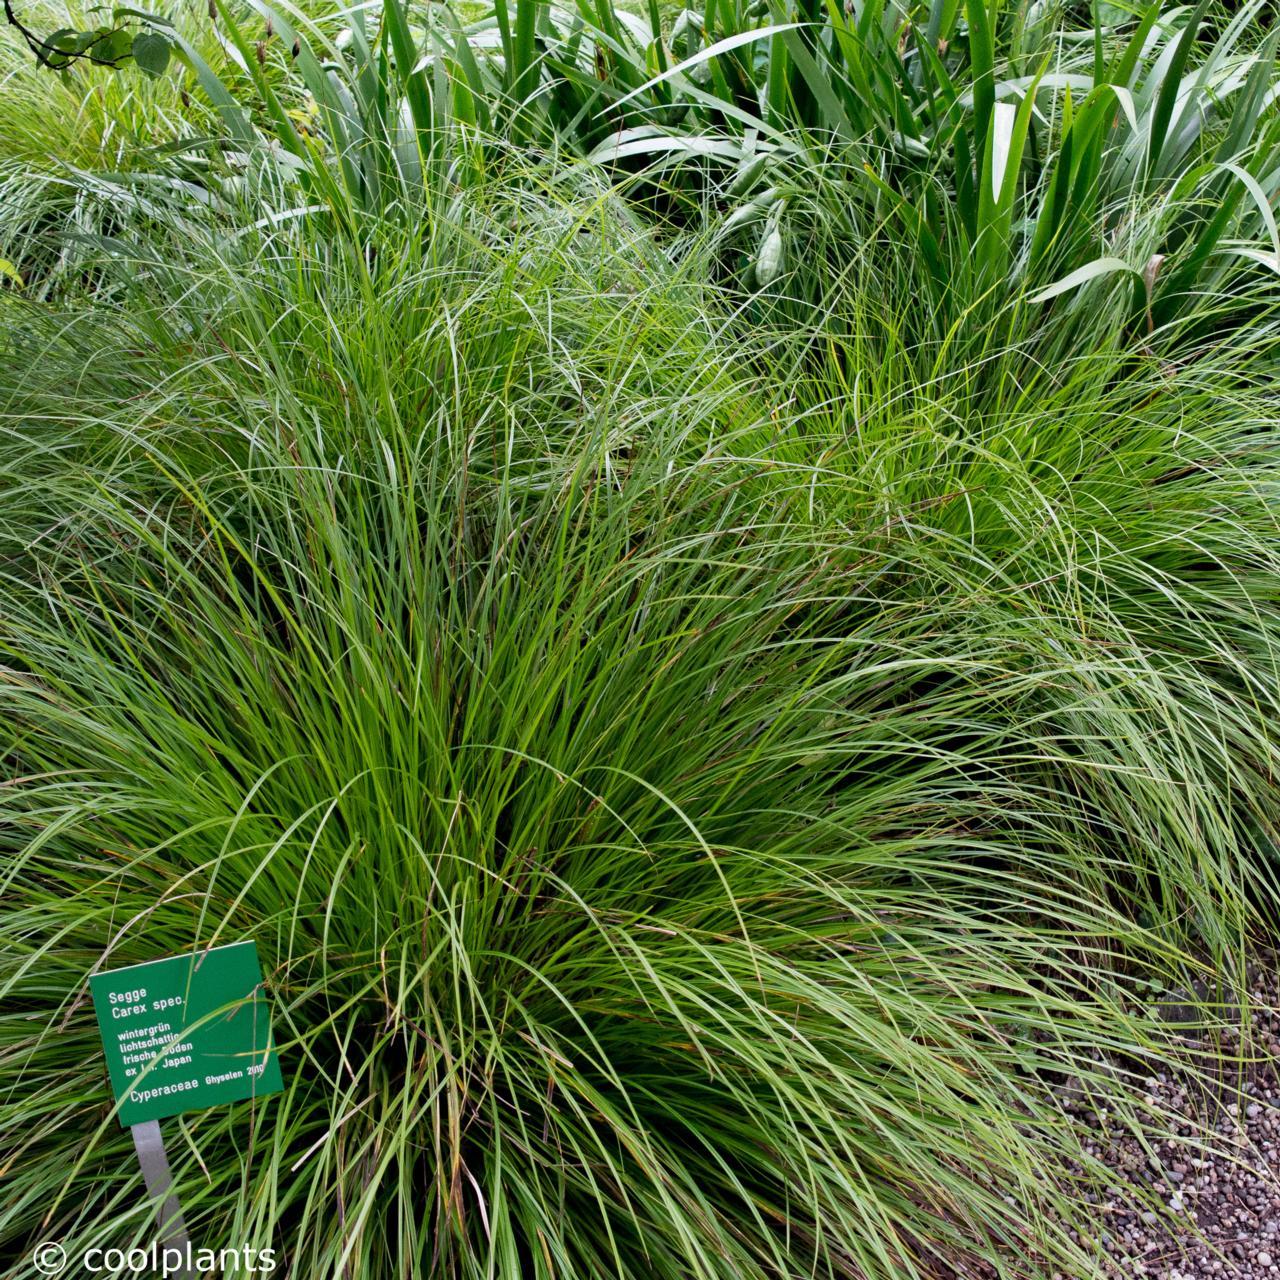 Carex 'Kyoto' plant